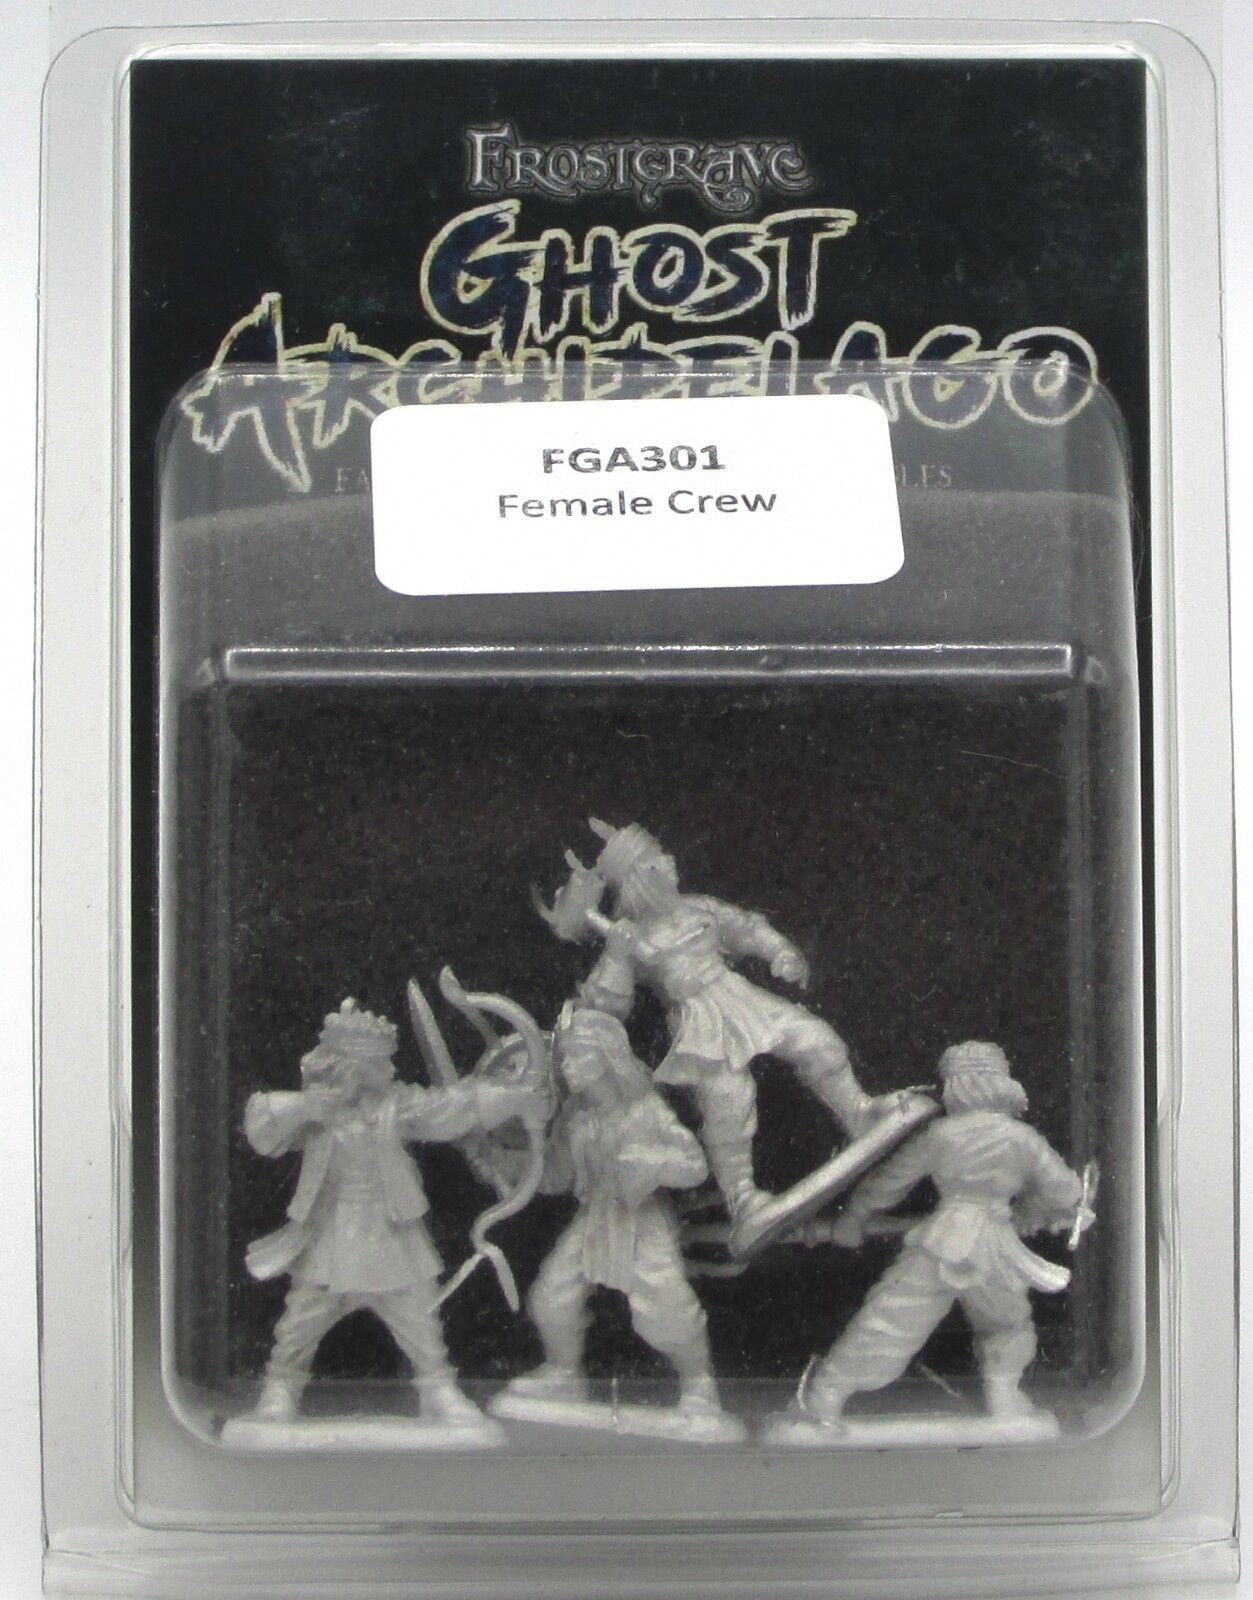 Frostgrave Ghost Archipelago Crewmen 28mm single sprue of 5